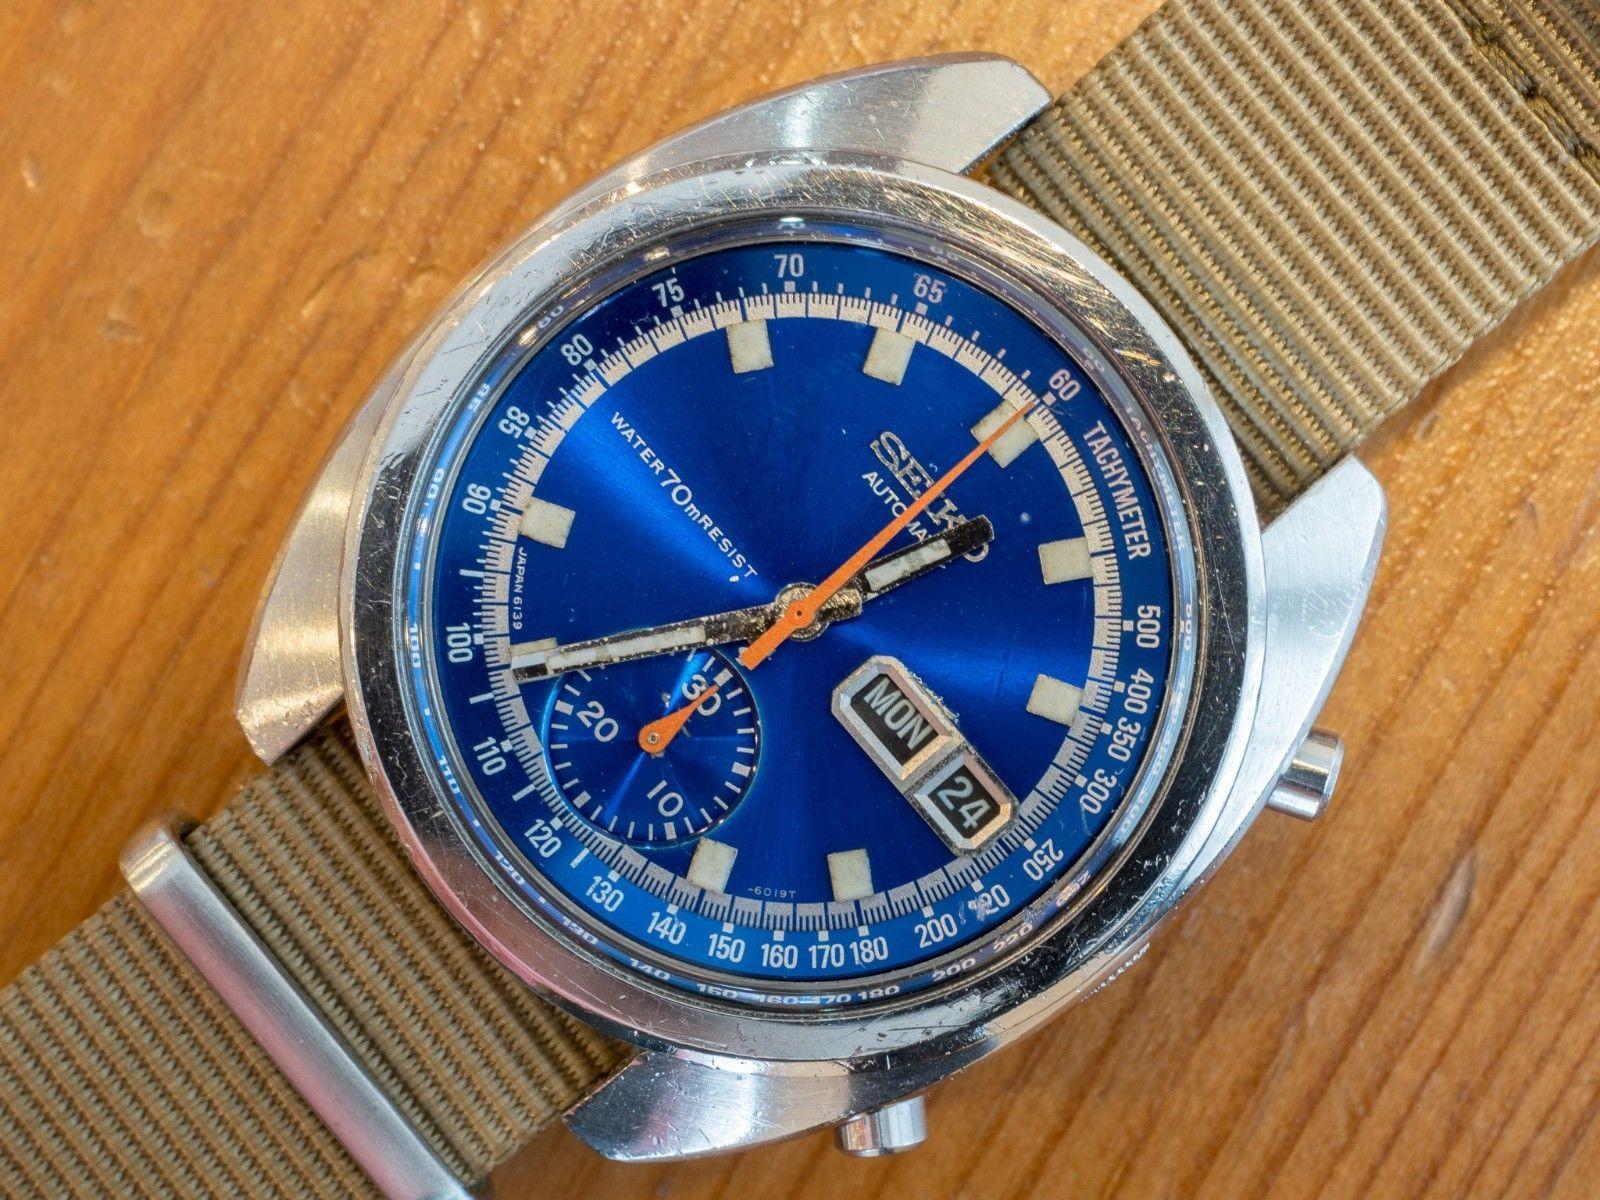 Seiko 6139-6015 Otomatik Saat Tamiri ve Bakımı - Seiko 6139 Kalibre